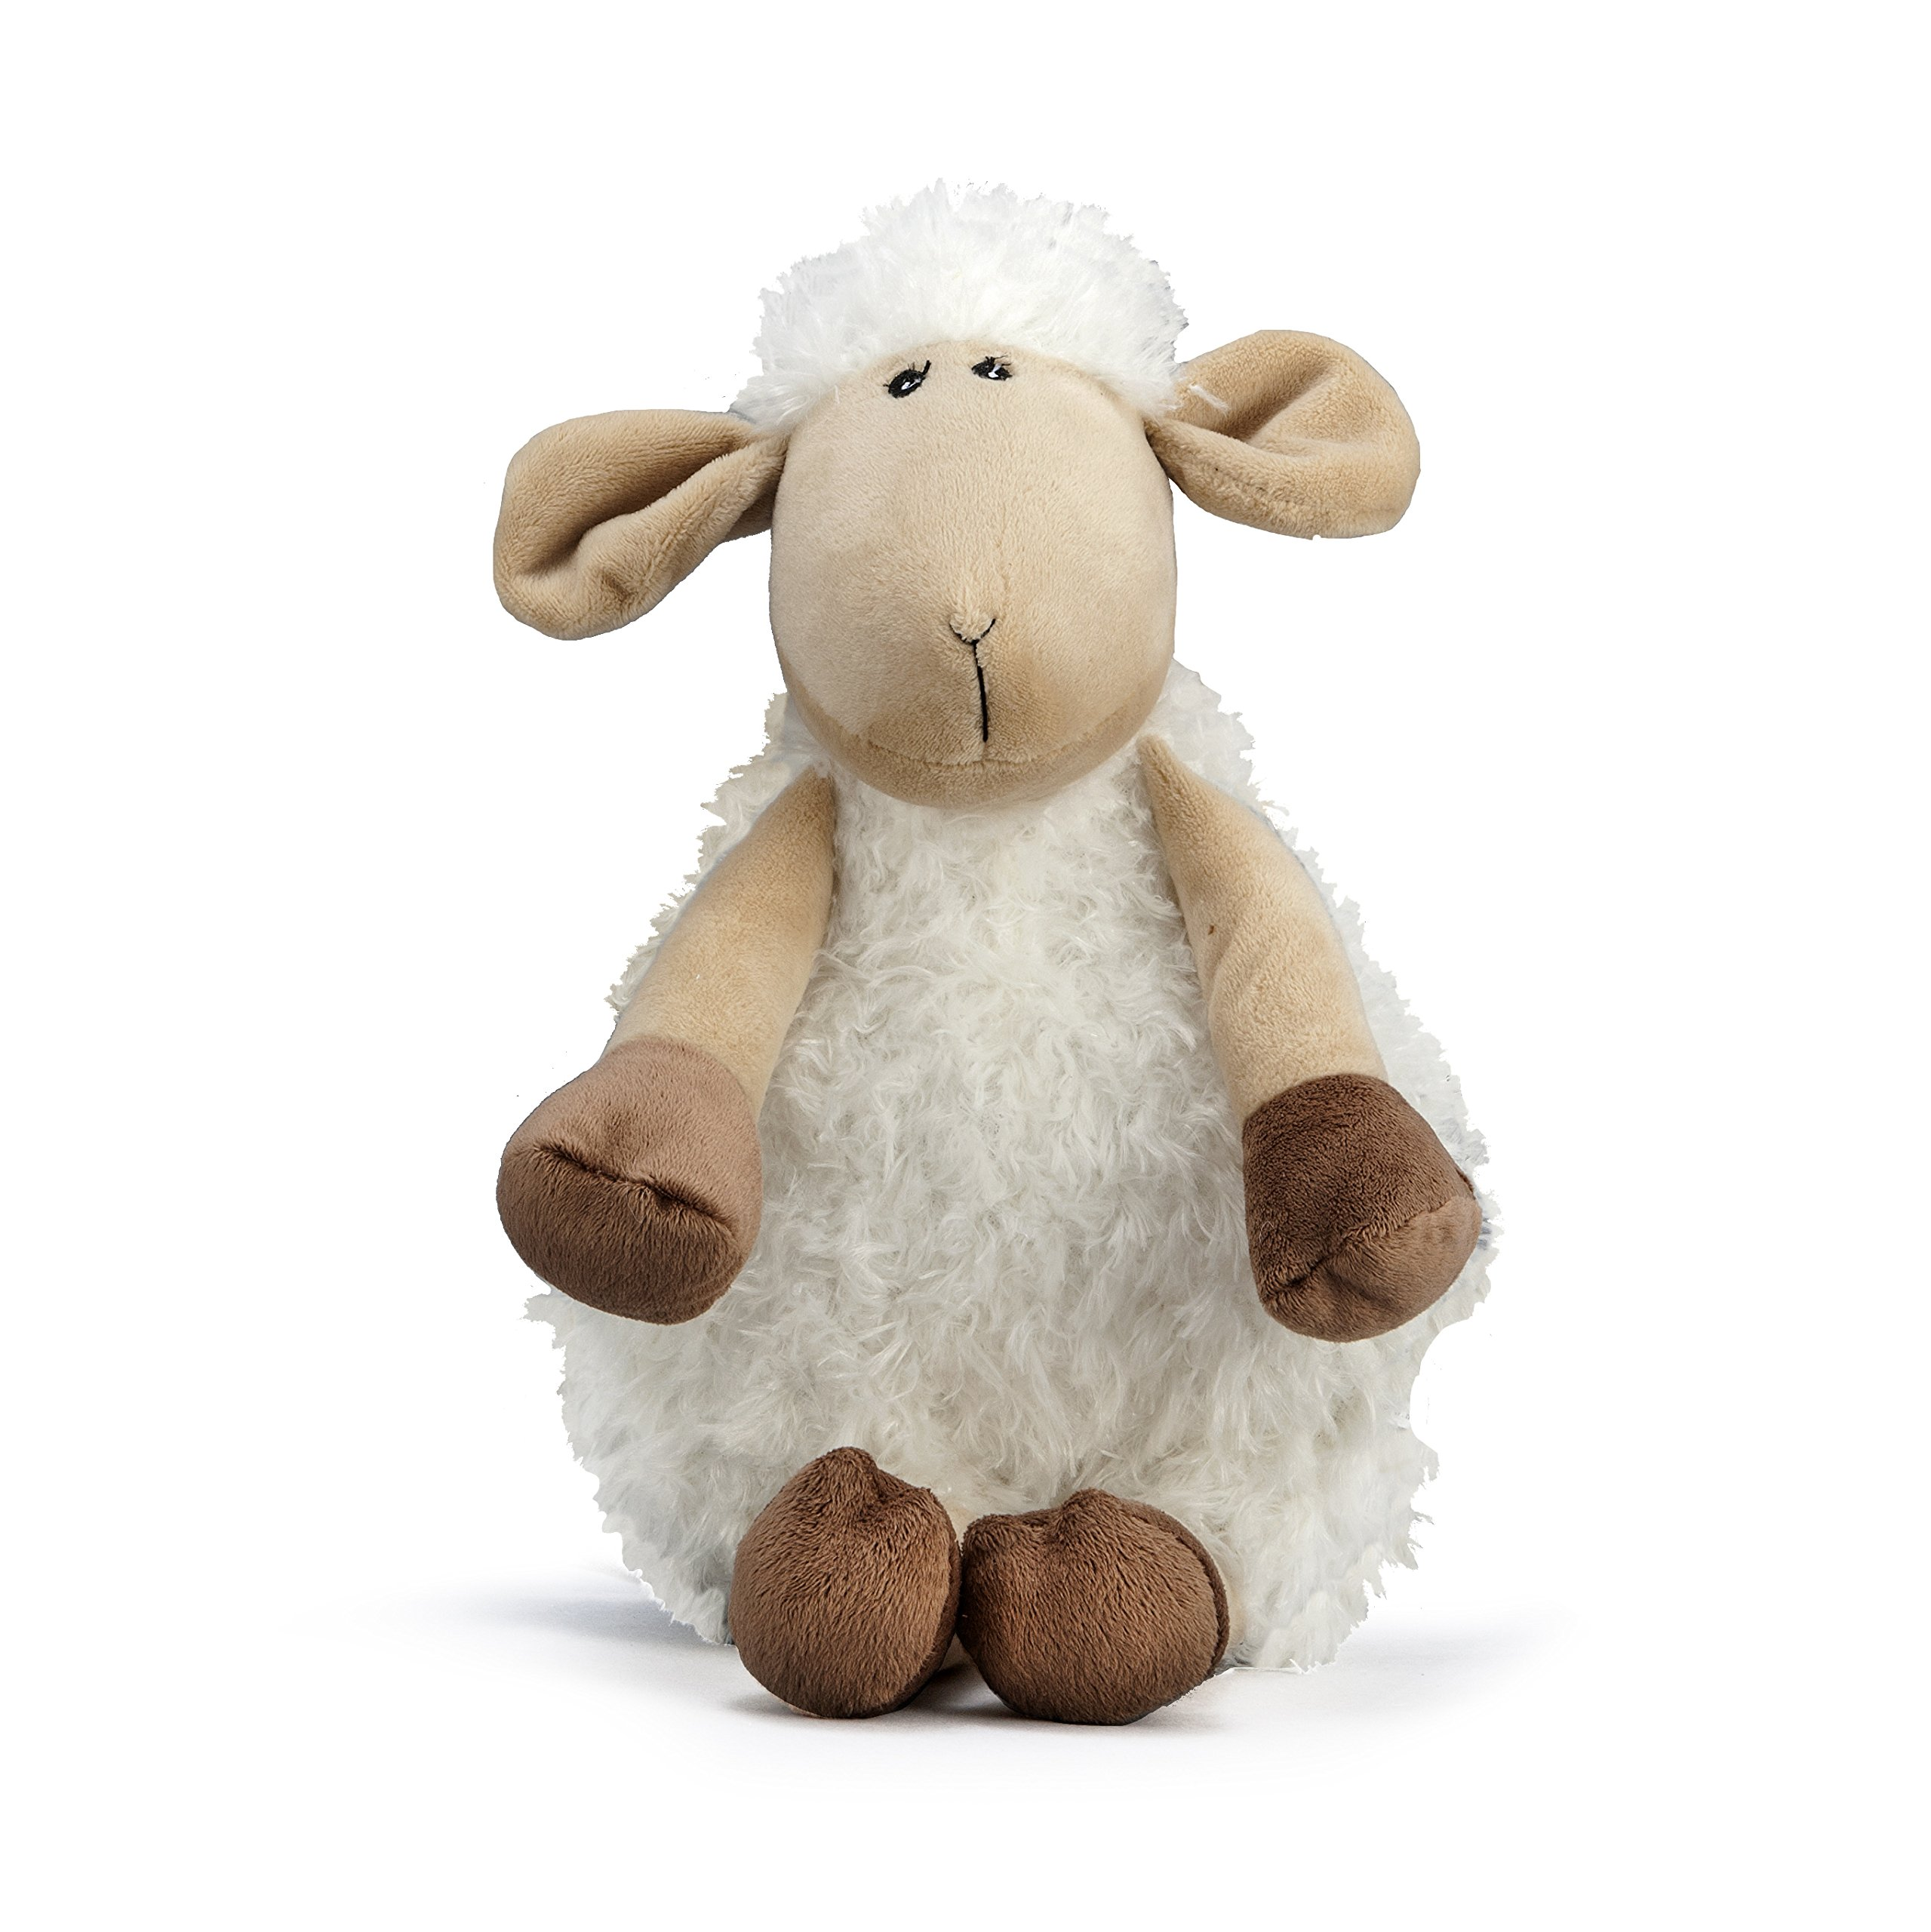 NANDOG My BFF Sheep Plush Dog Squeaky Toy (Beige)